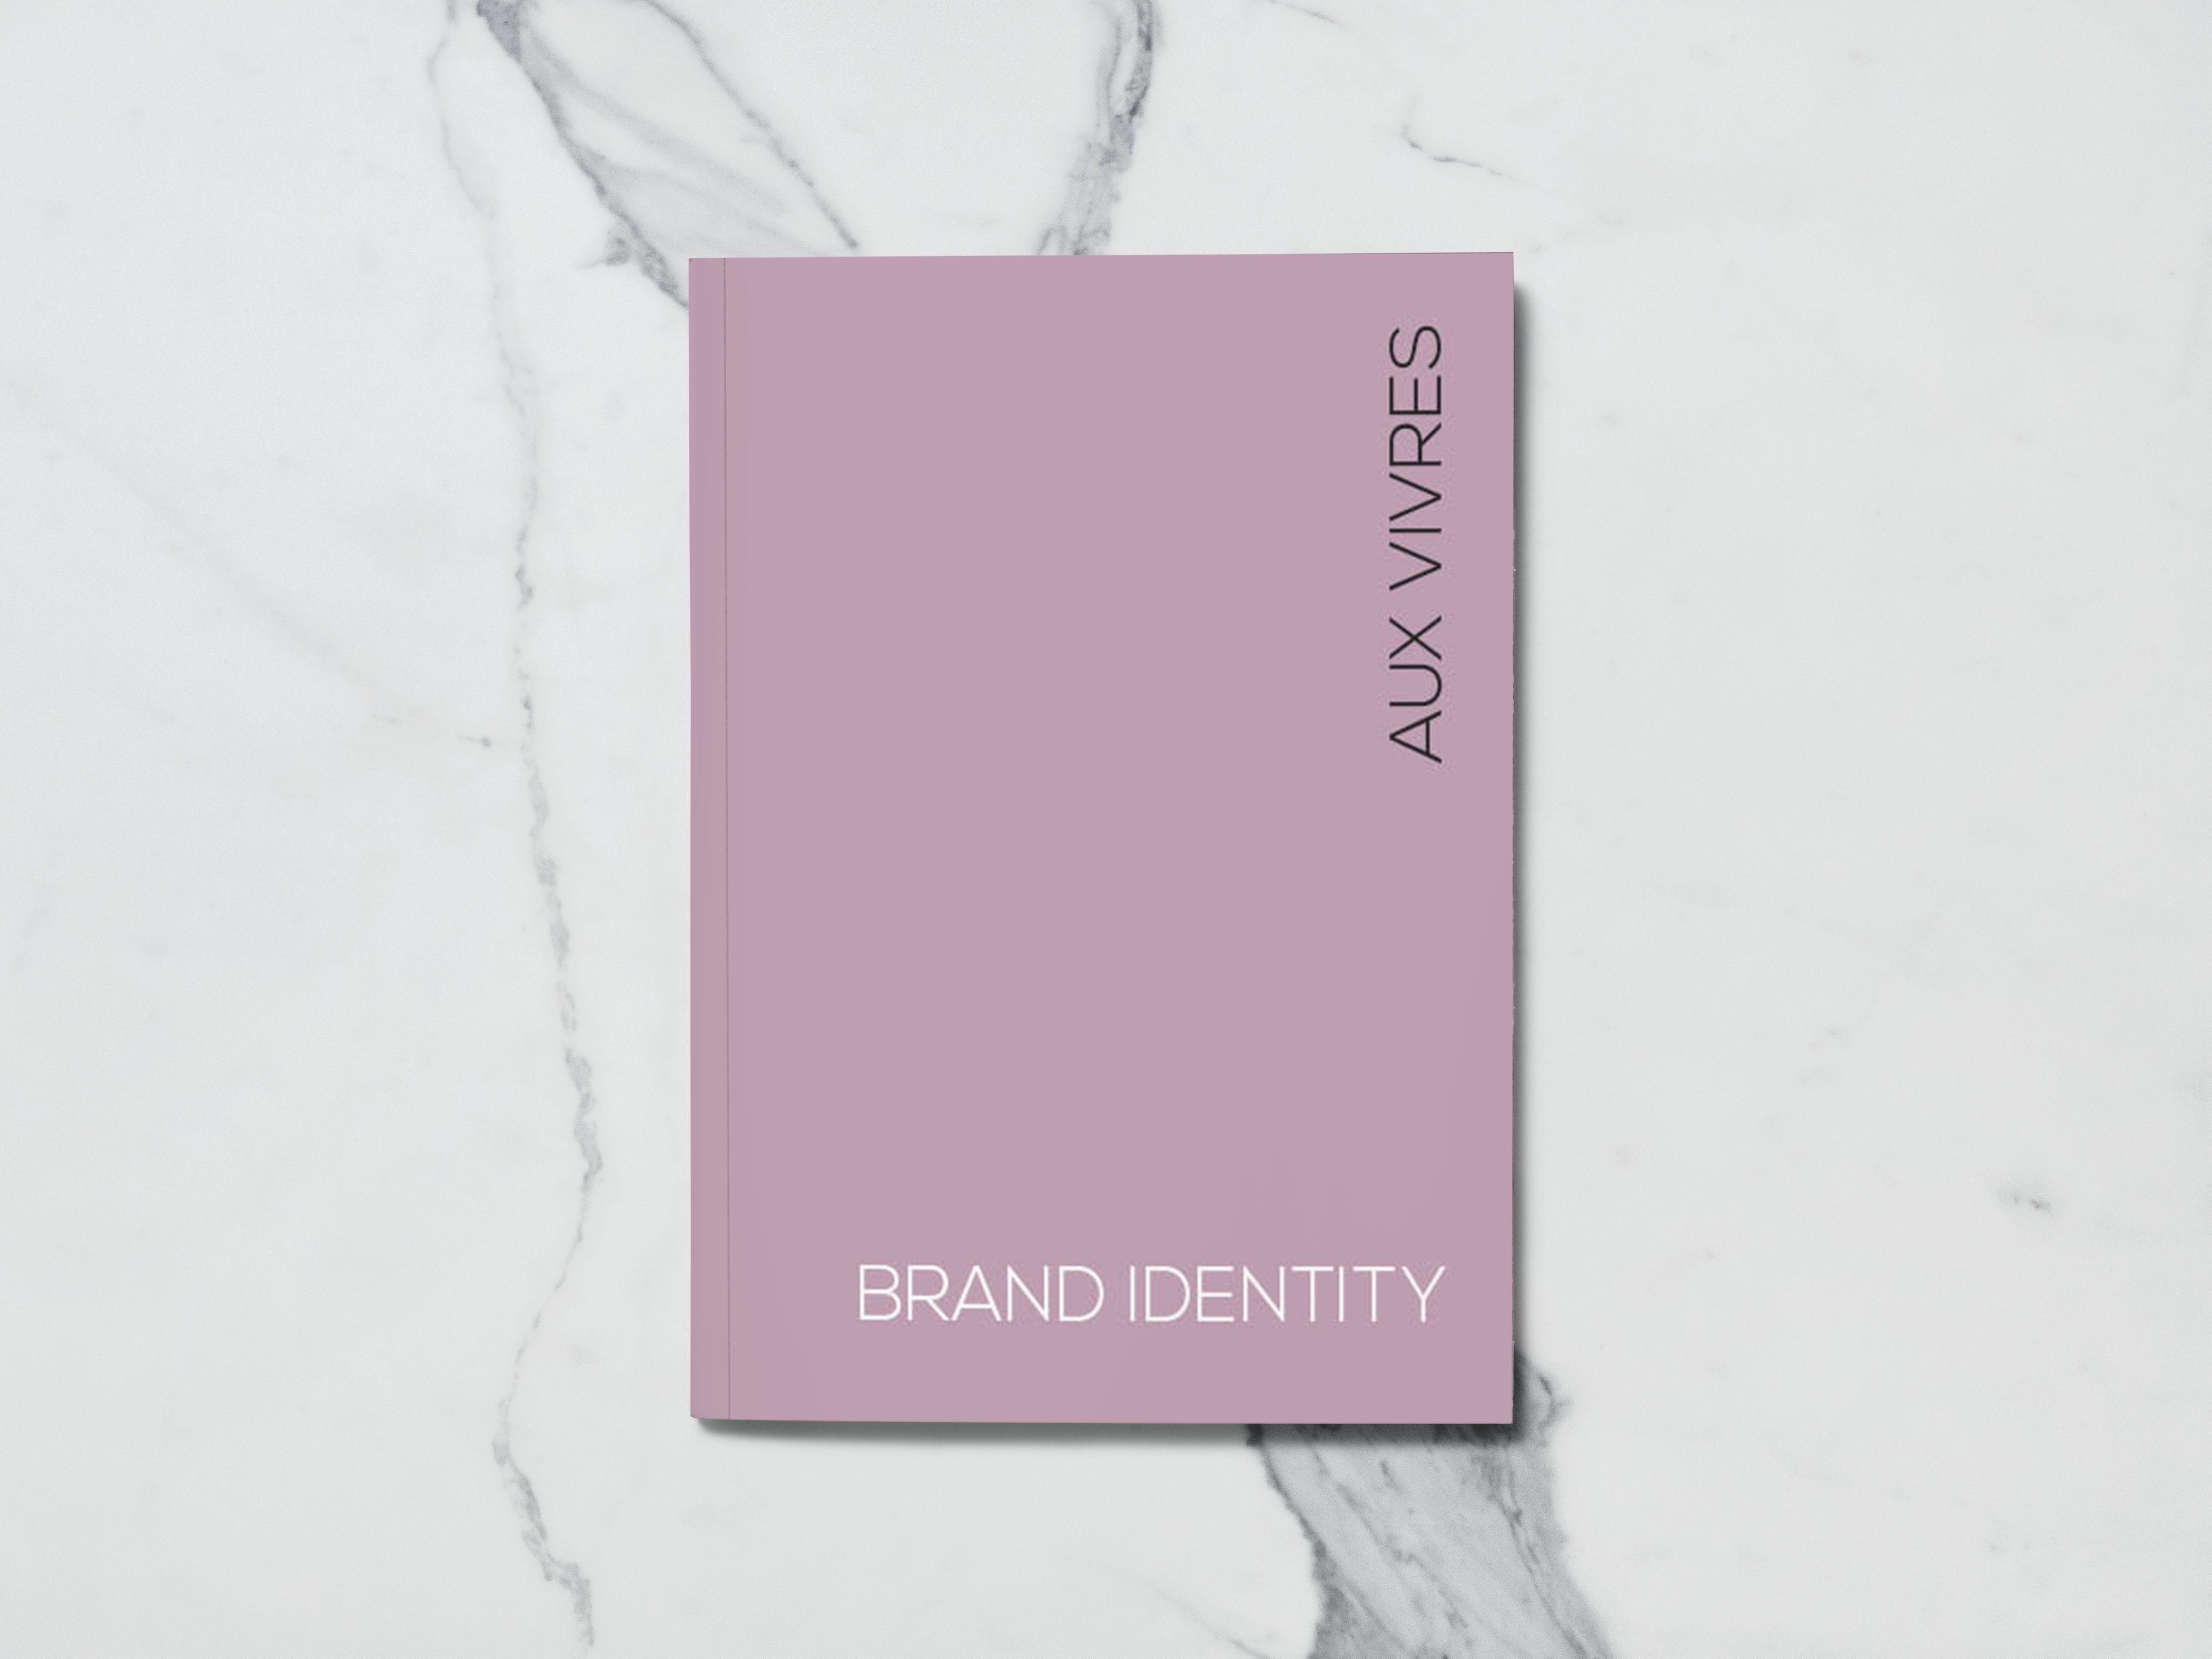 Aux Vivres brand identity